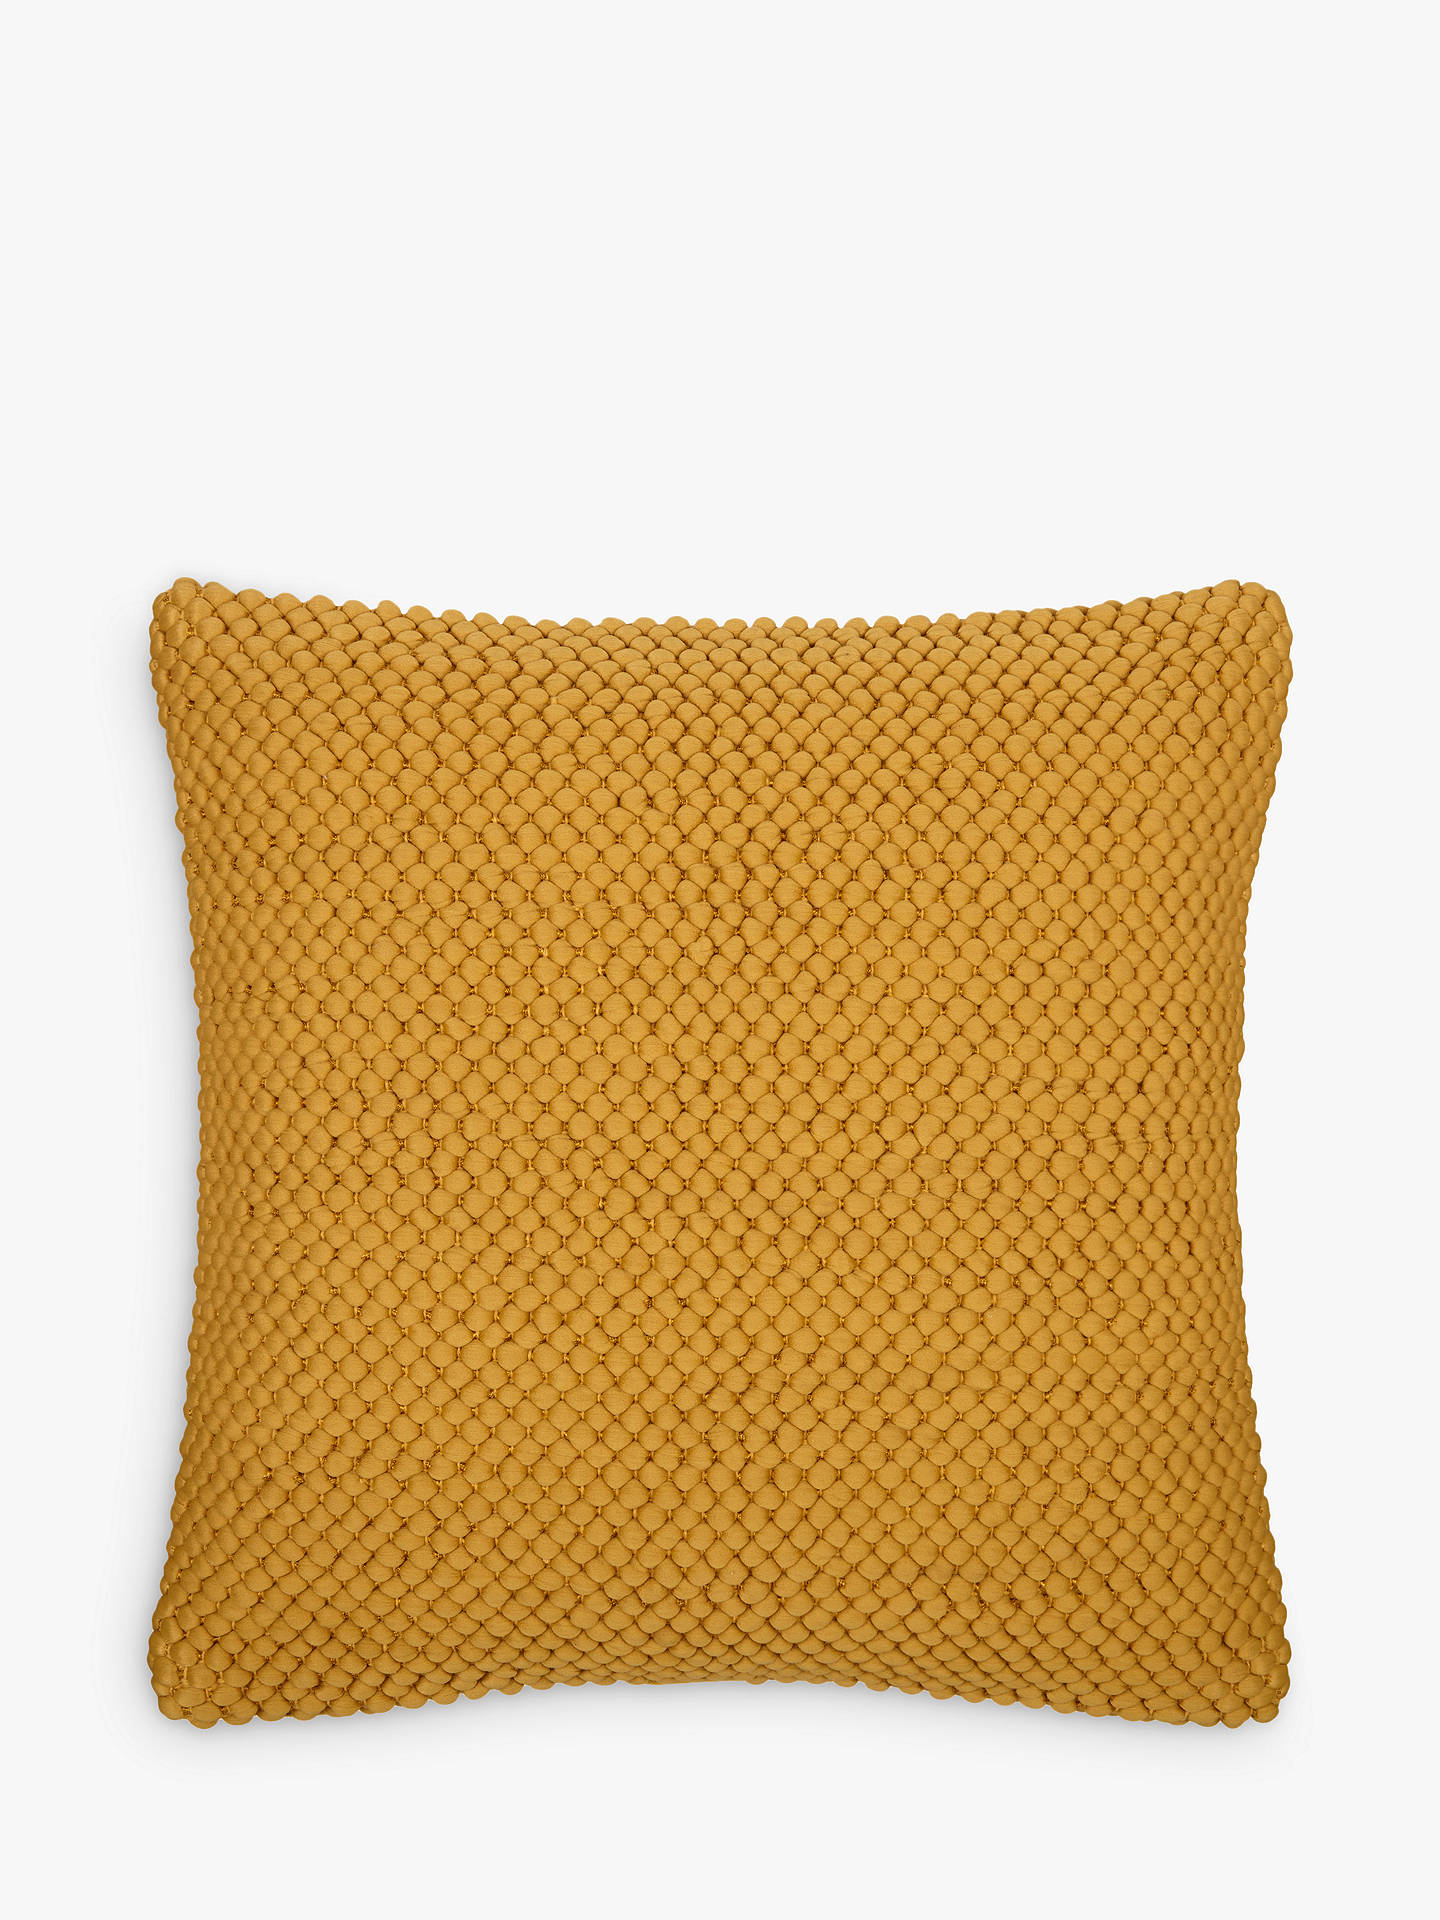 john lewis partners pebble cushion at john lewis partners. Black Bedroom Furniture Sets. Home Design Ideas